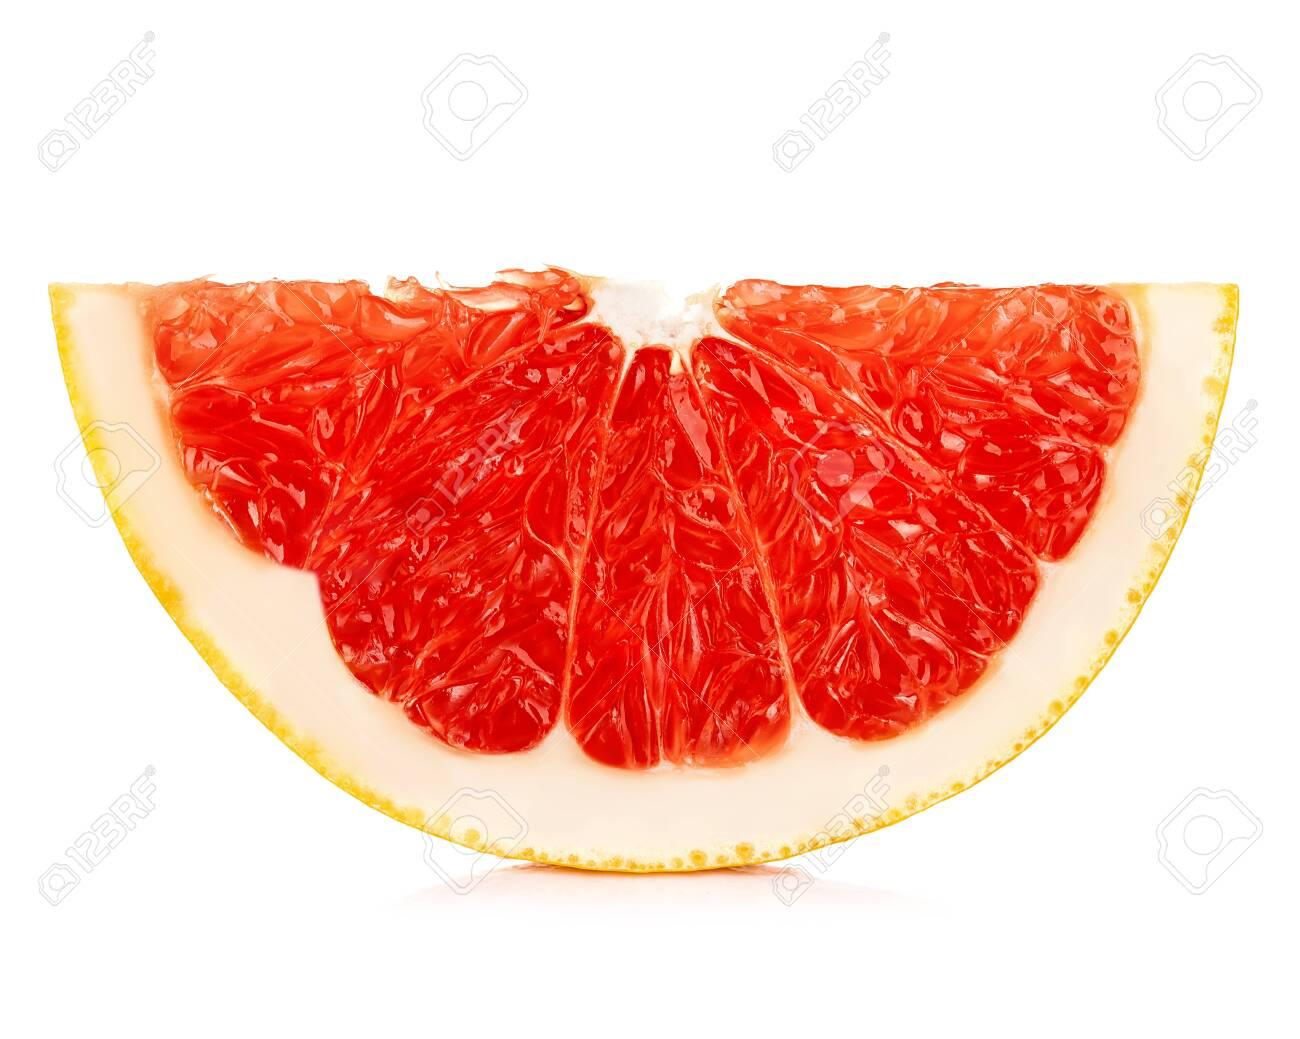 Grapefruit slice isolated on a white background. - 126197438